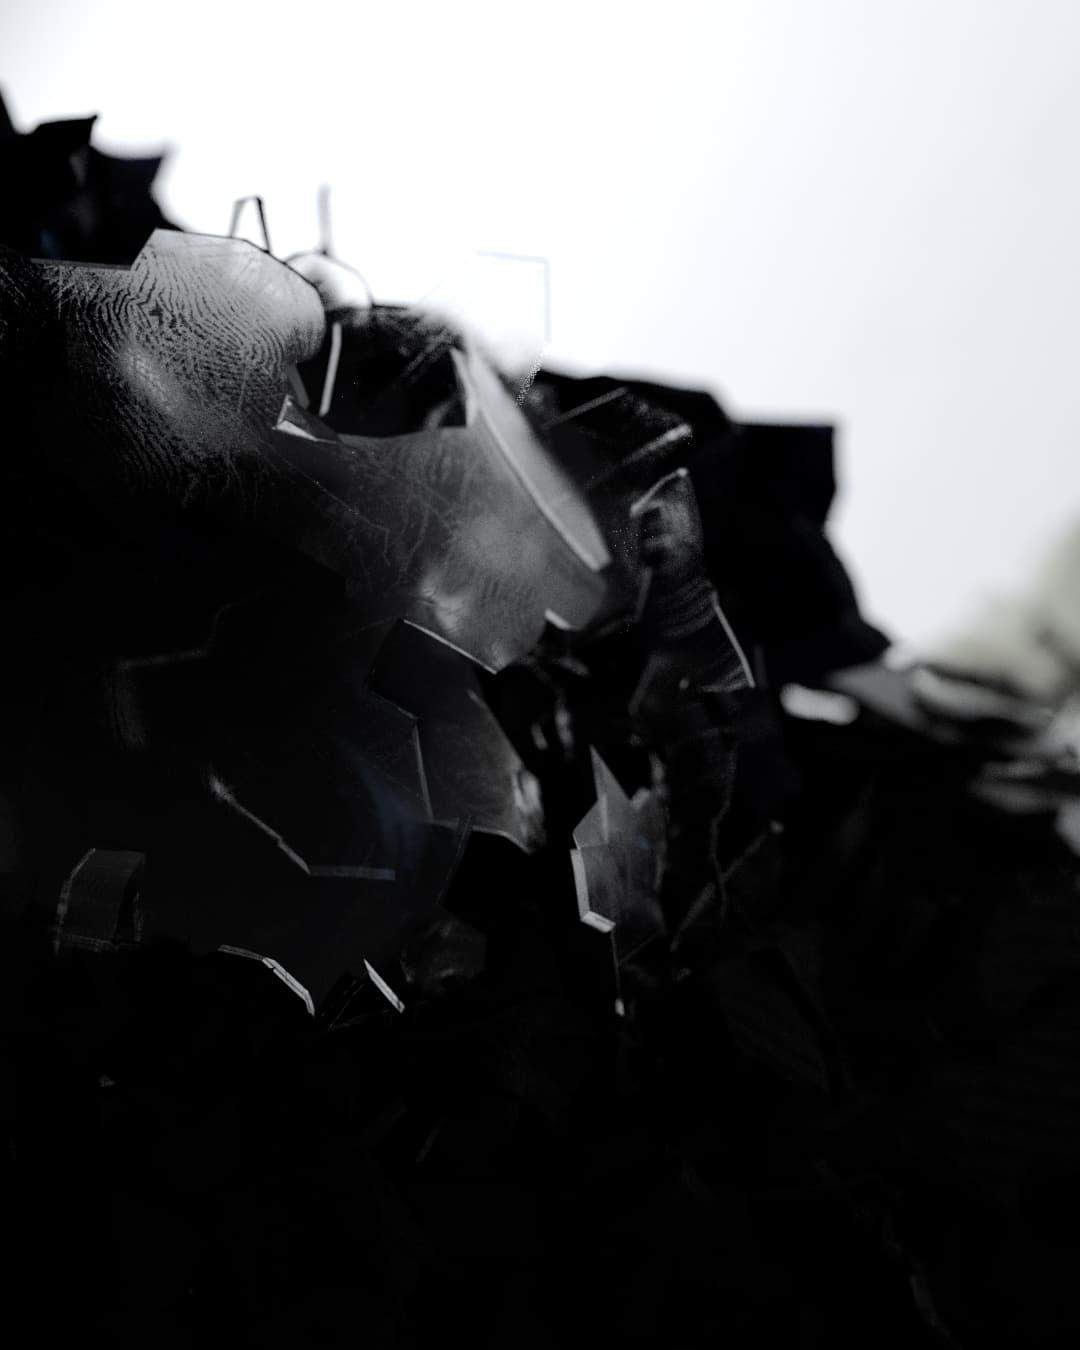 02_Recycling_RE_v402